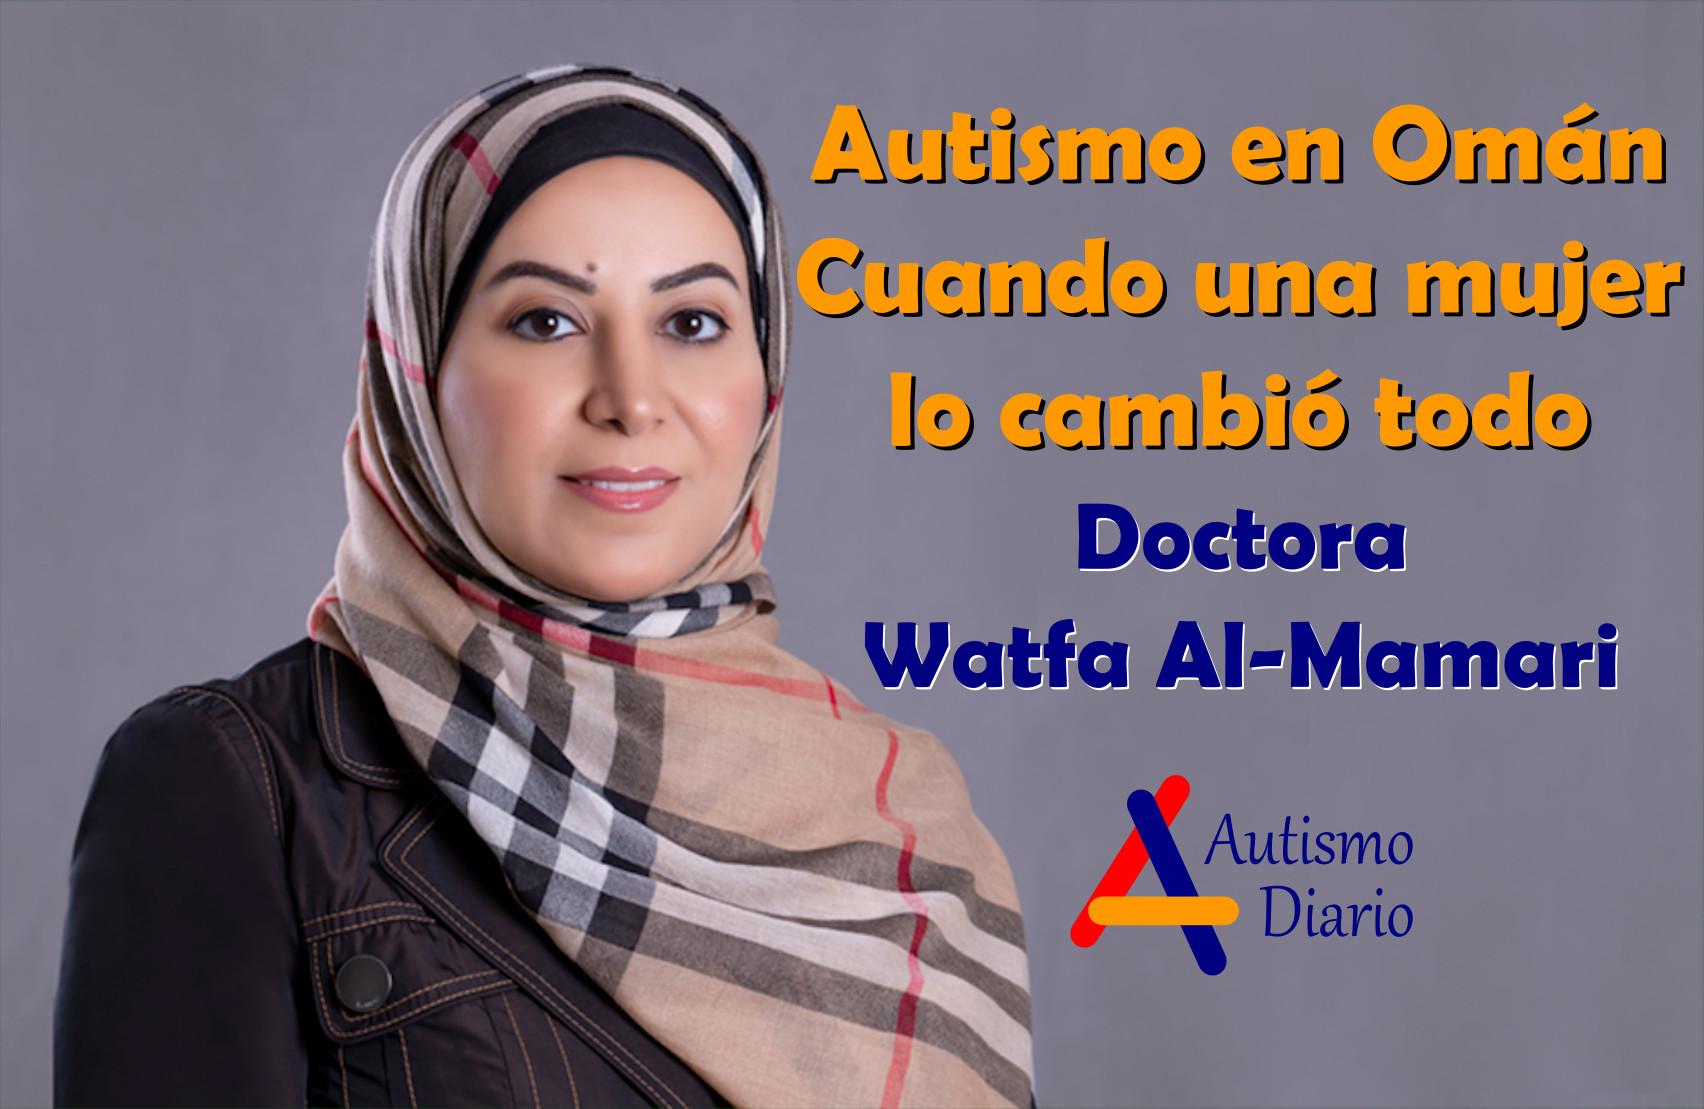 Doctora Watfa Al-Mamari Autismo Oman